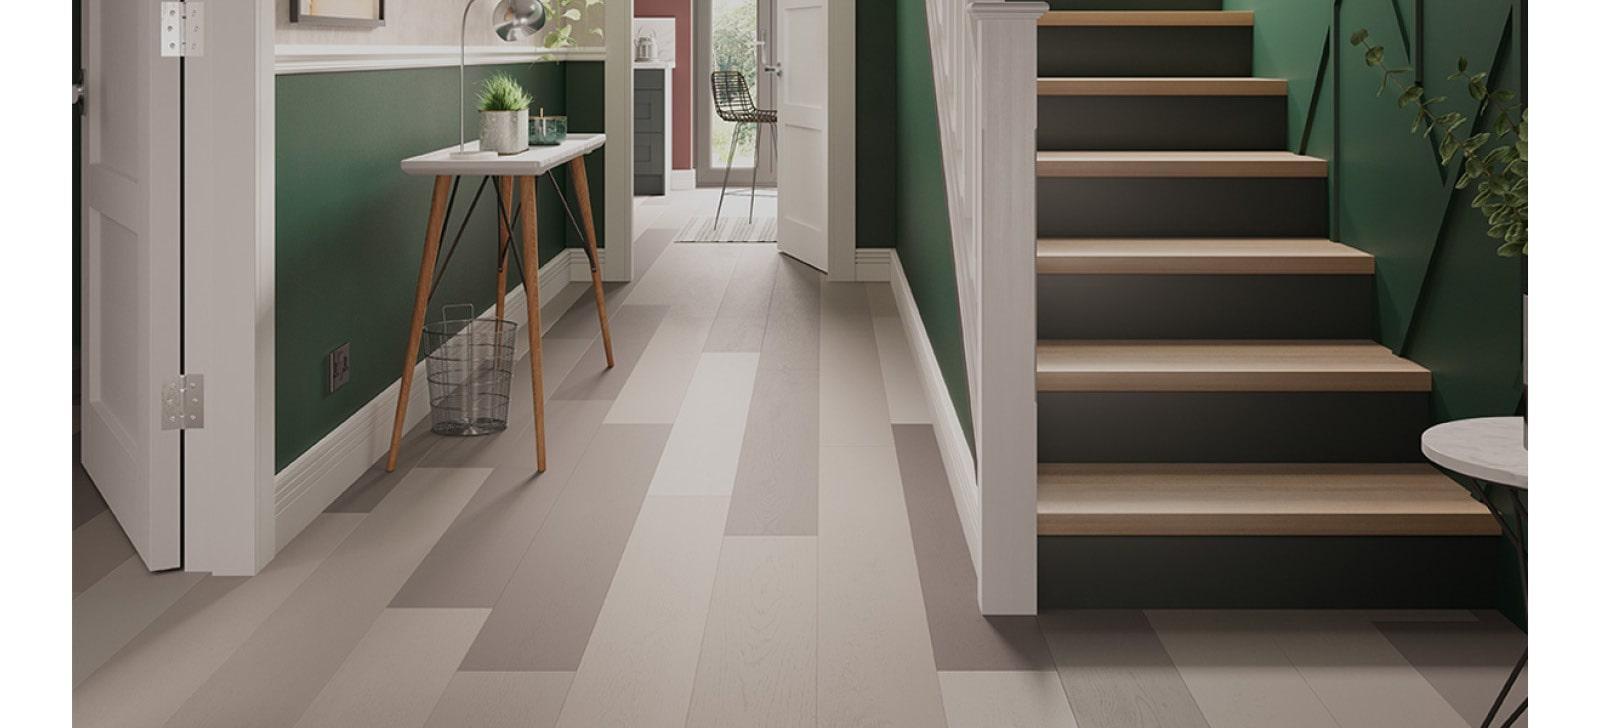 Shades of grey painted hallway flooring